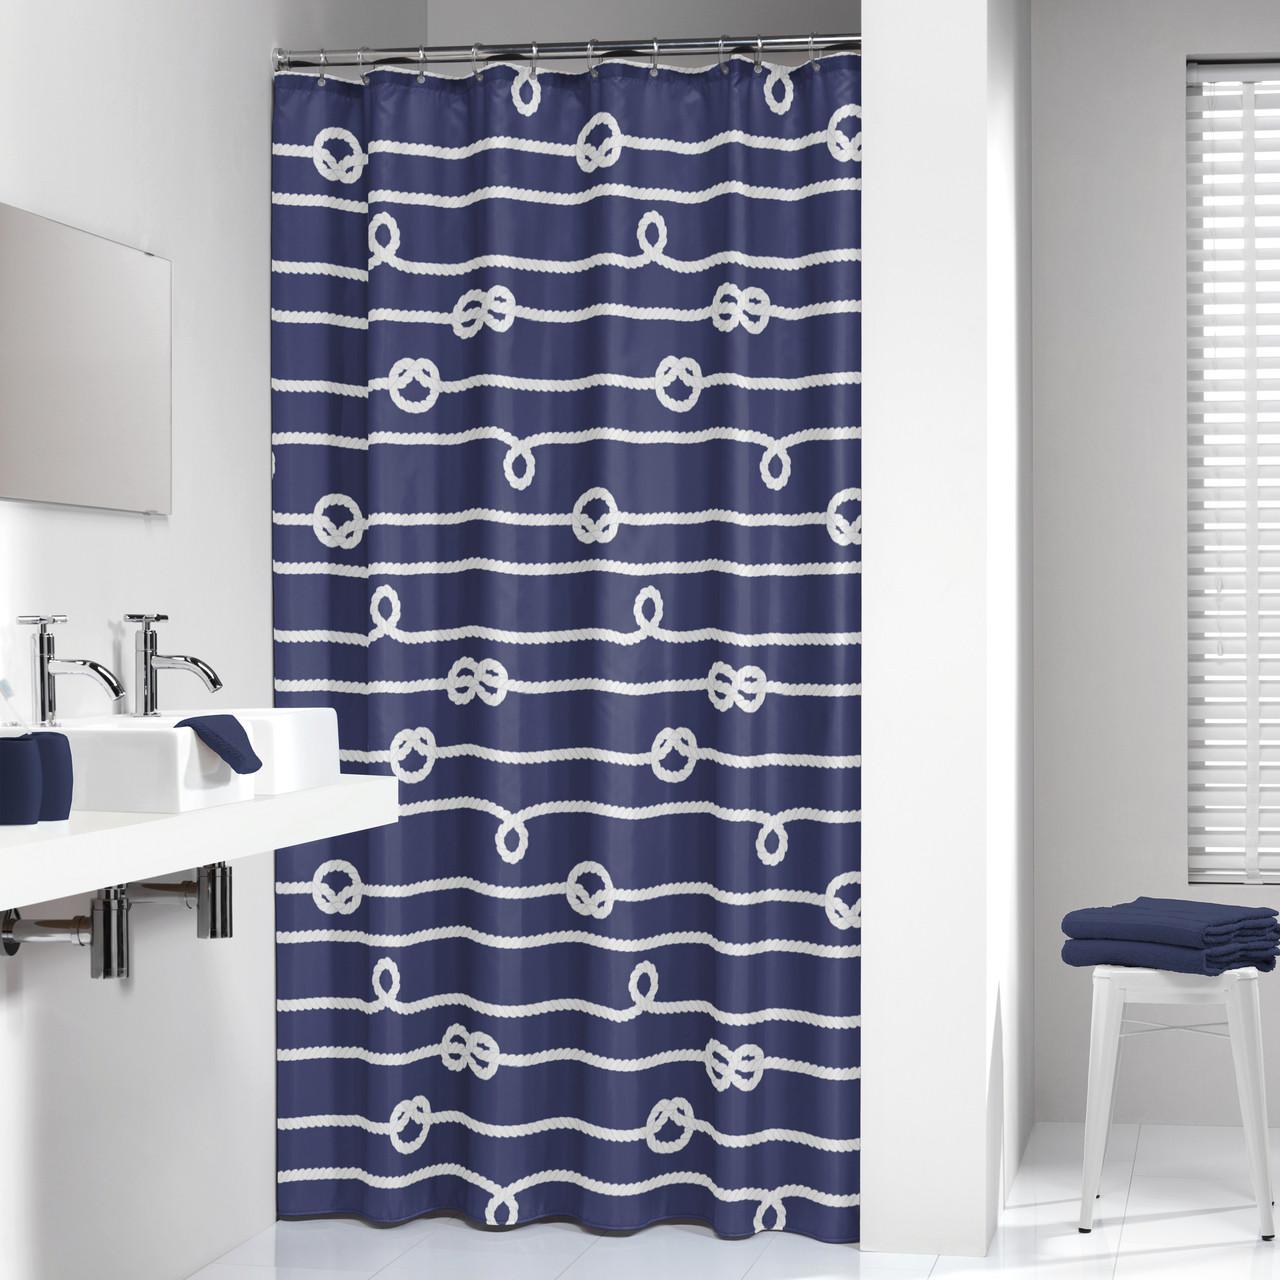 8719401362250 15100 Sealskin Na Bathroomaccessories Moodimage Rope Blue Original JPG 488301521460734c2imbypasson